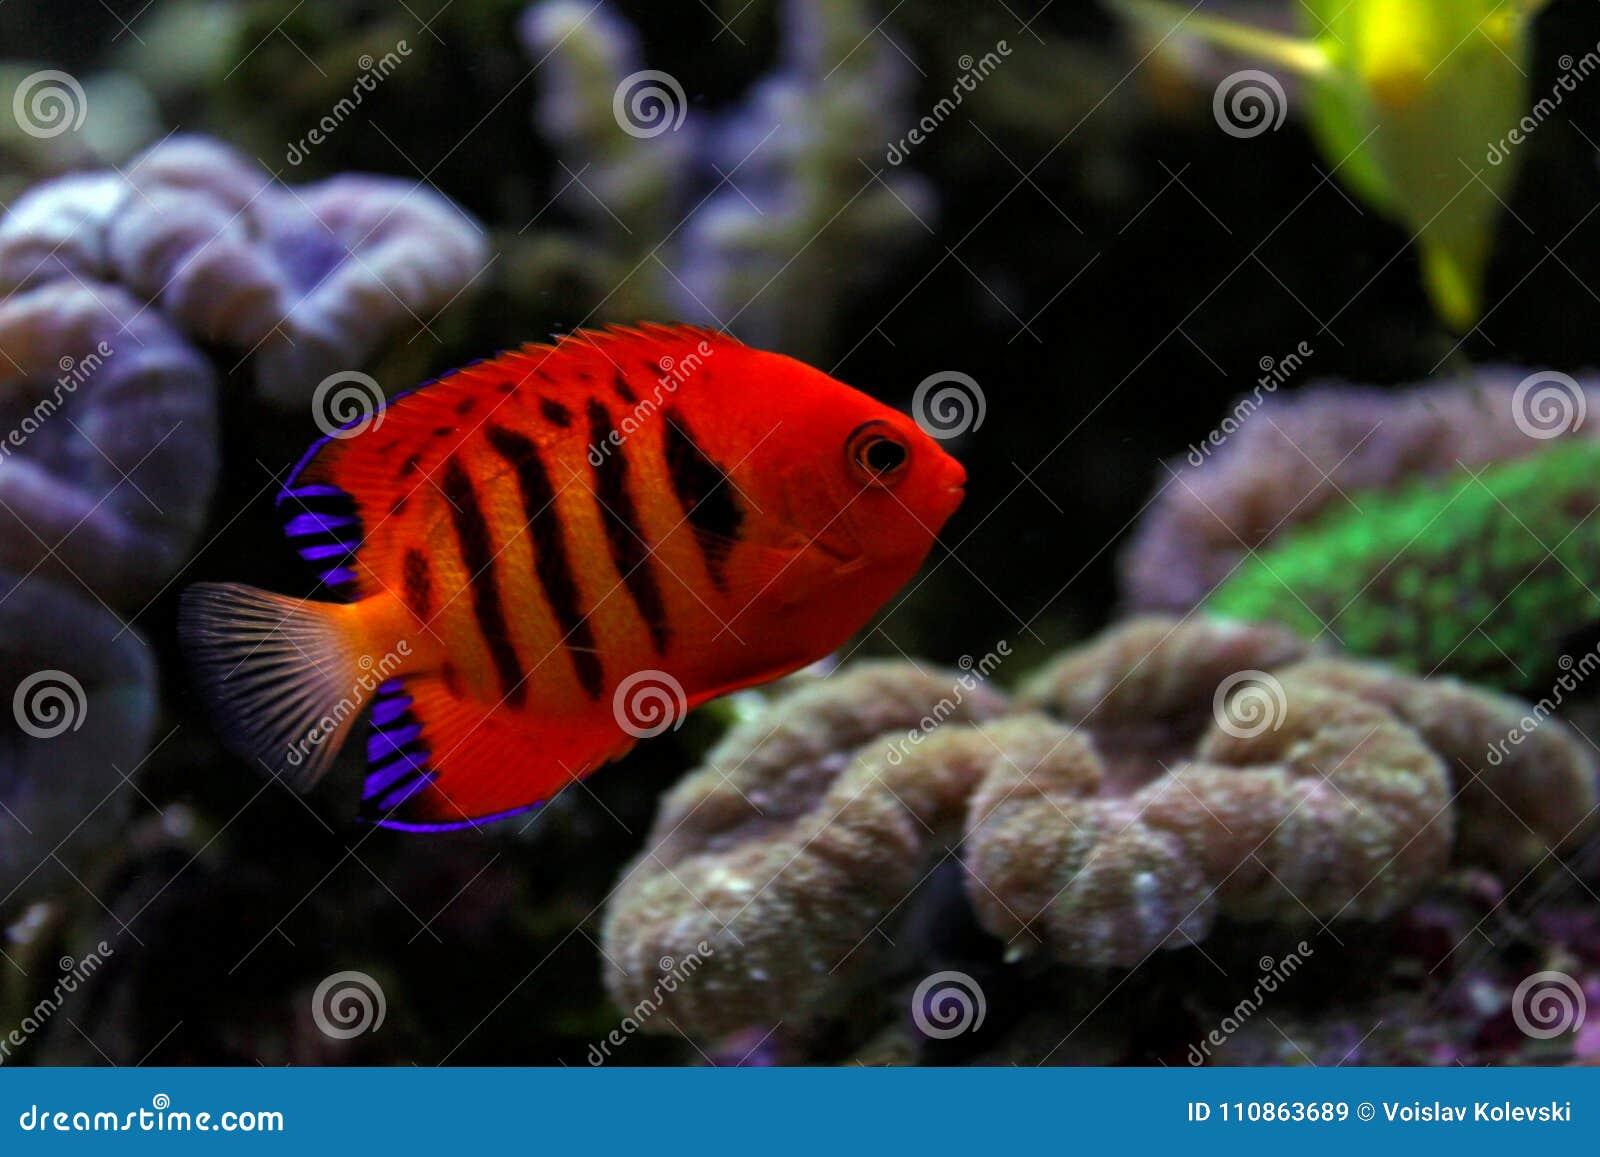 Flame Angelfish Centropyge Loricula Stock Image Image Of Flame